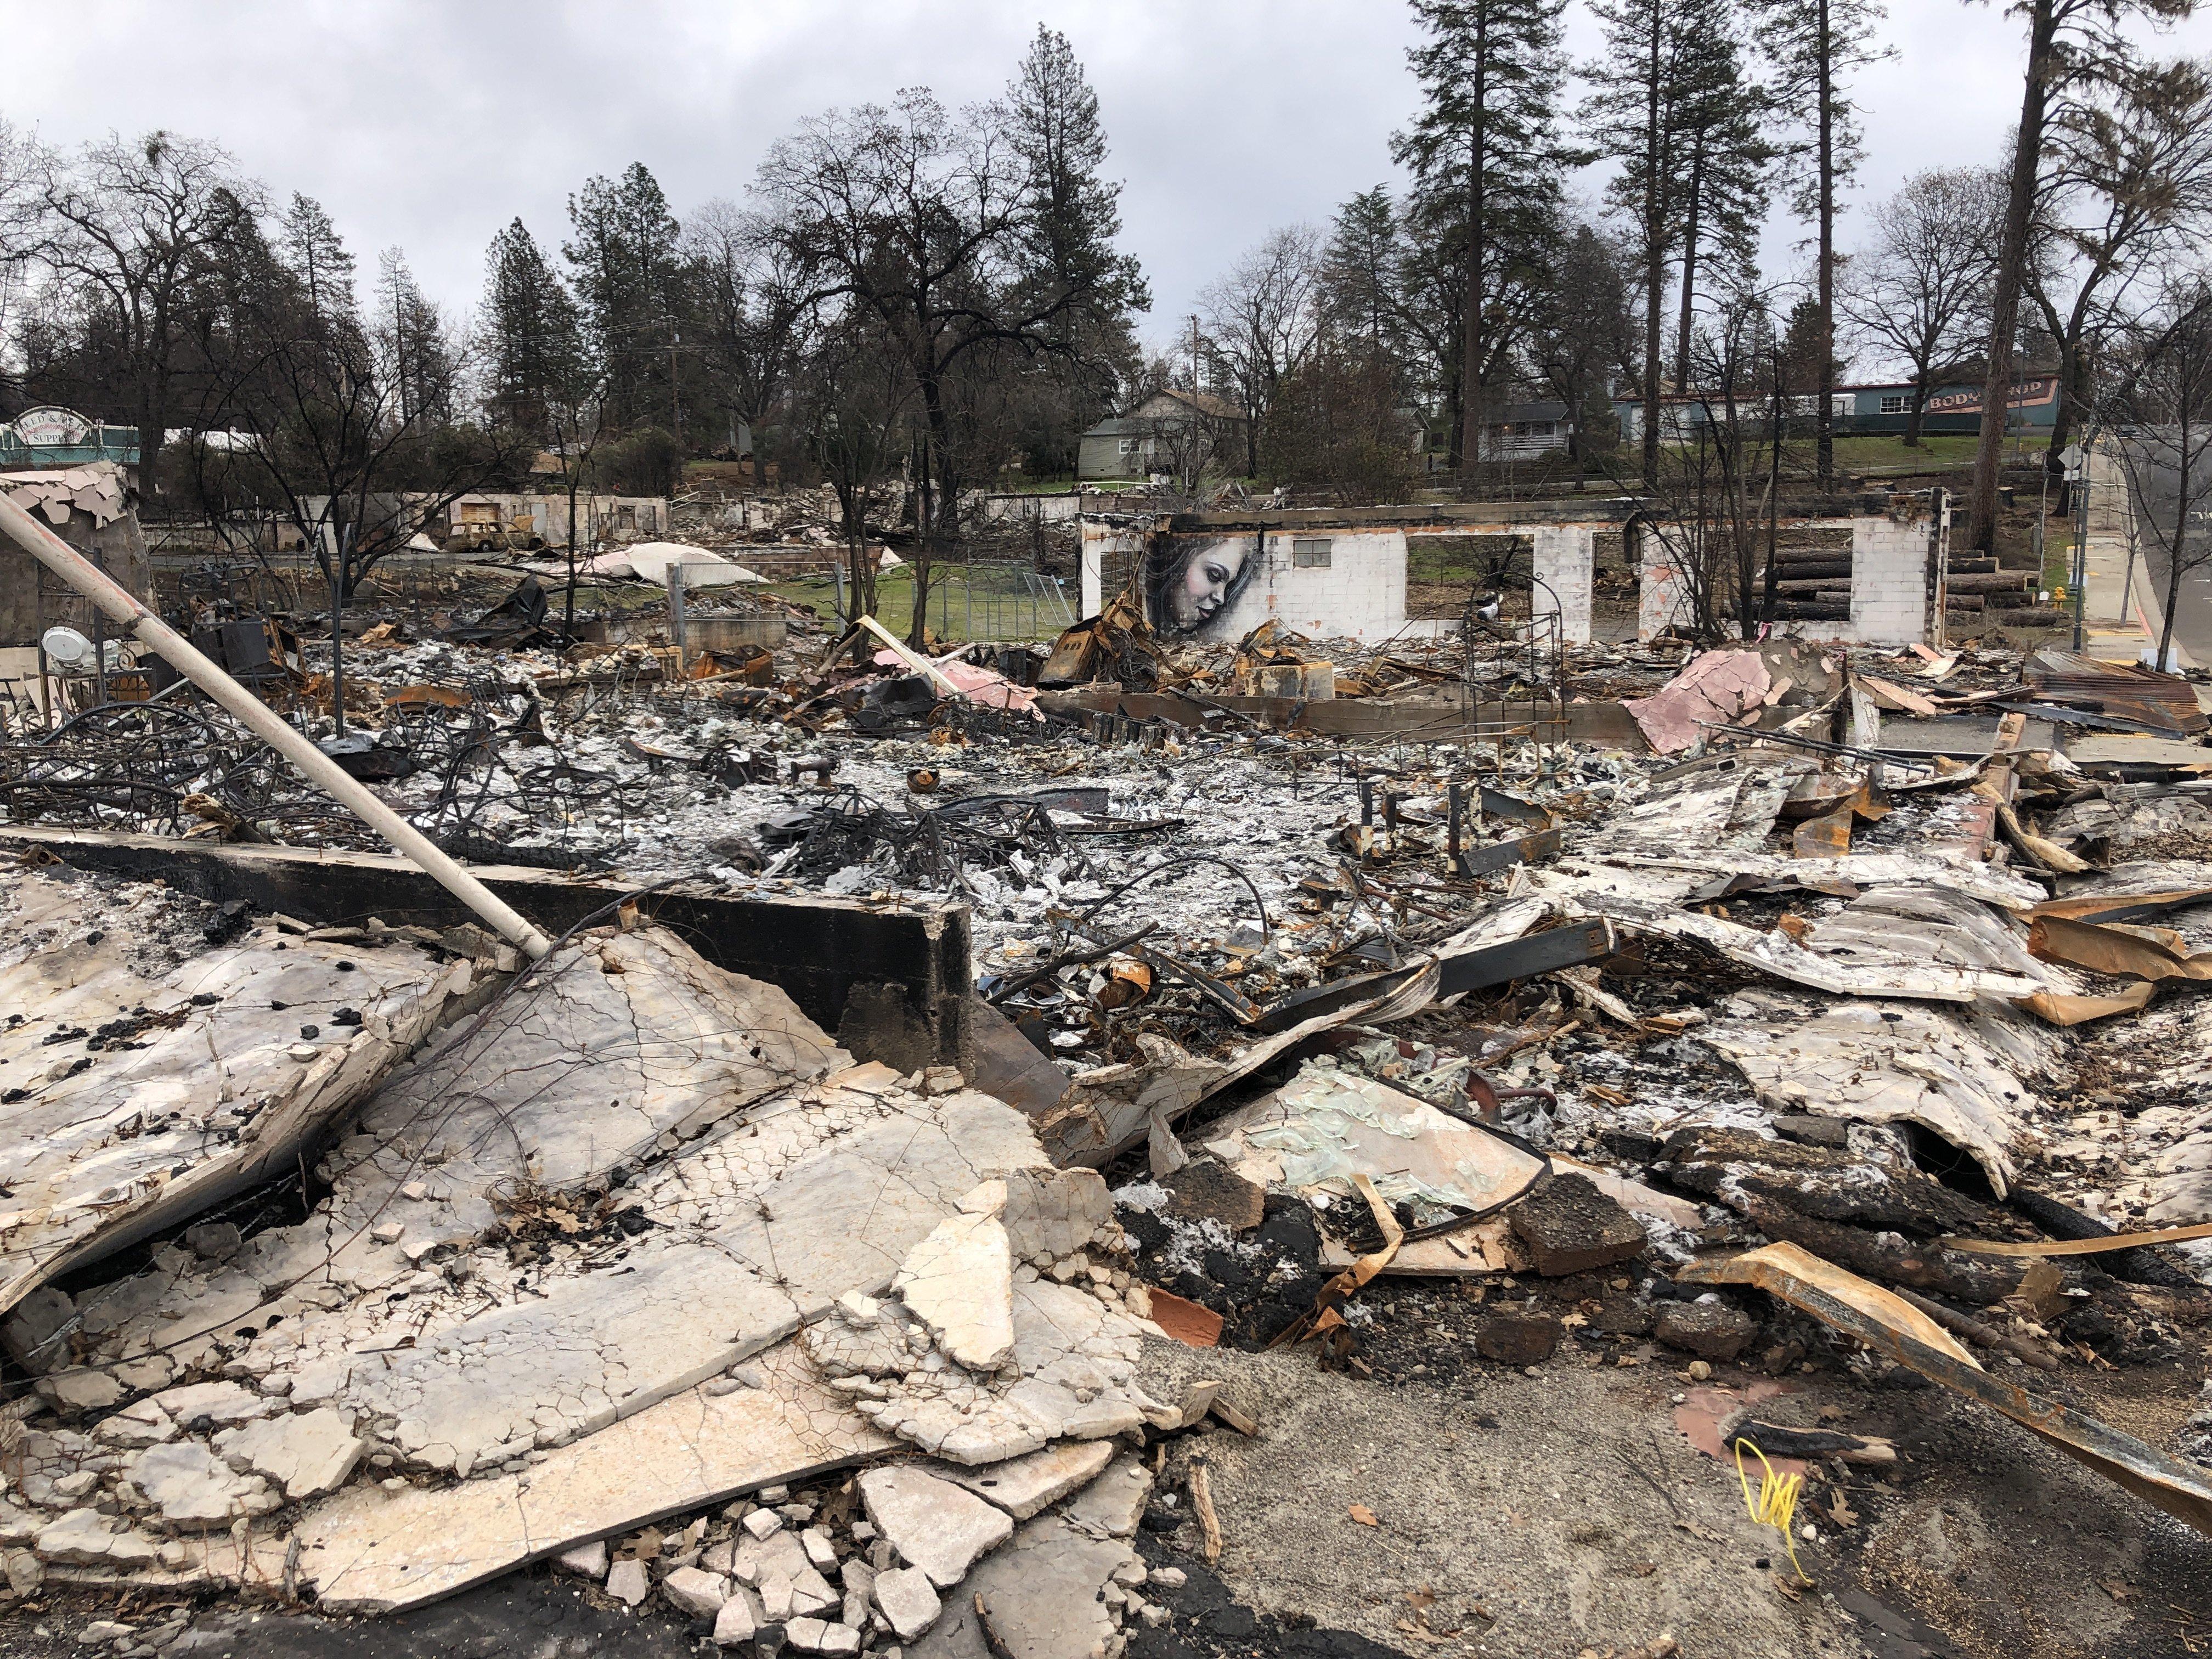 Burned buildings off the main road in Paradise -- Feb. 12, 2019